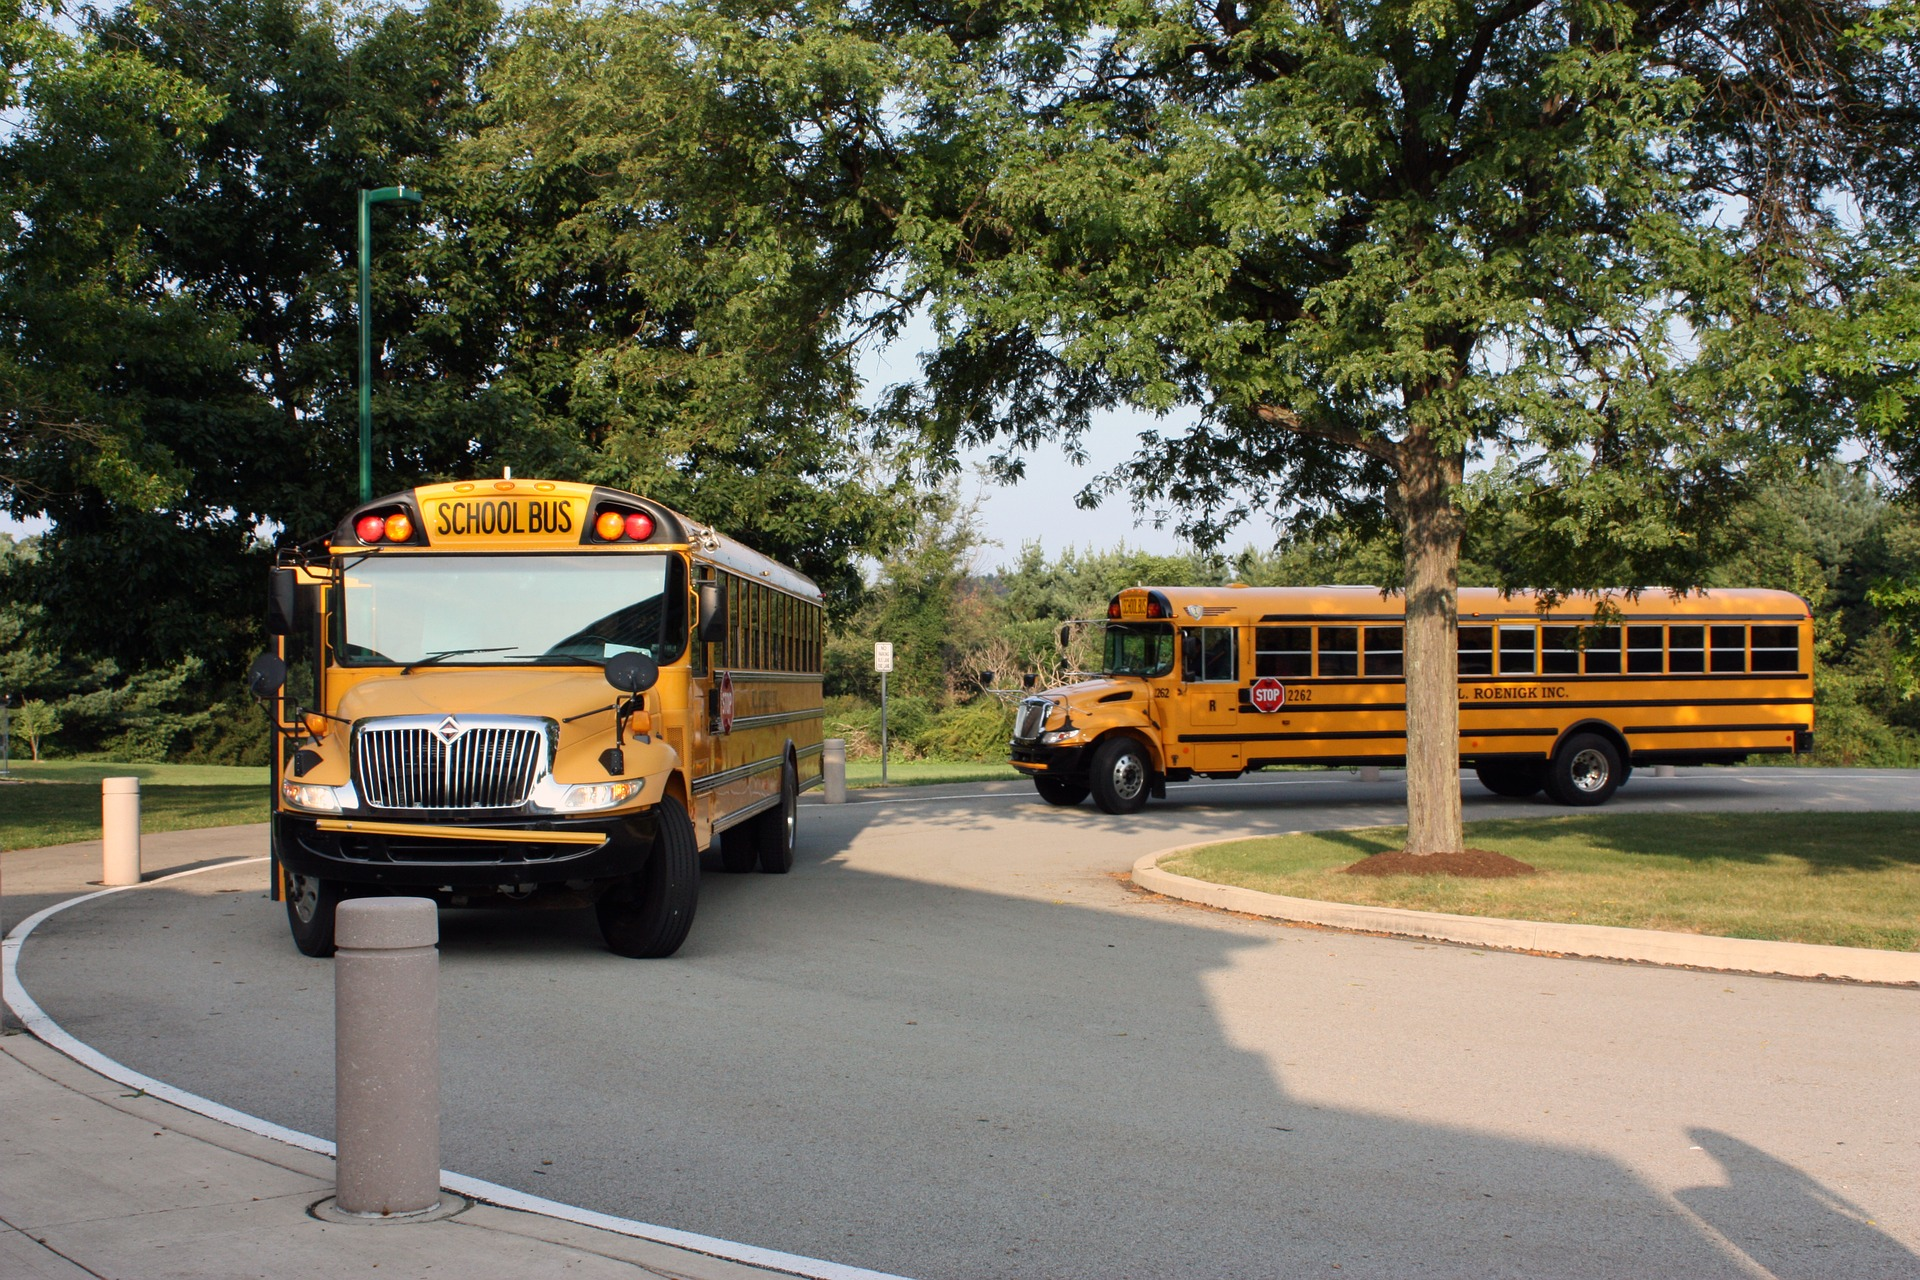 school-bus-1770047_1920